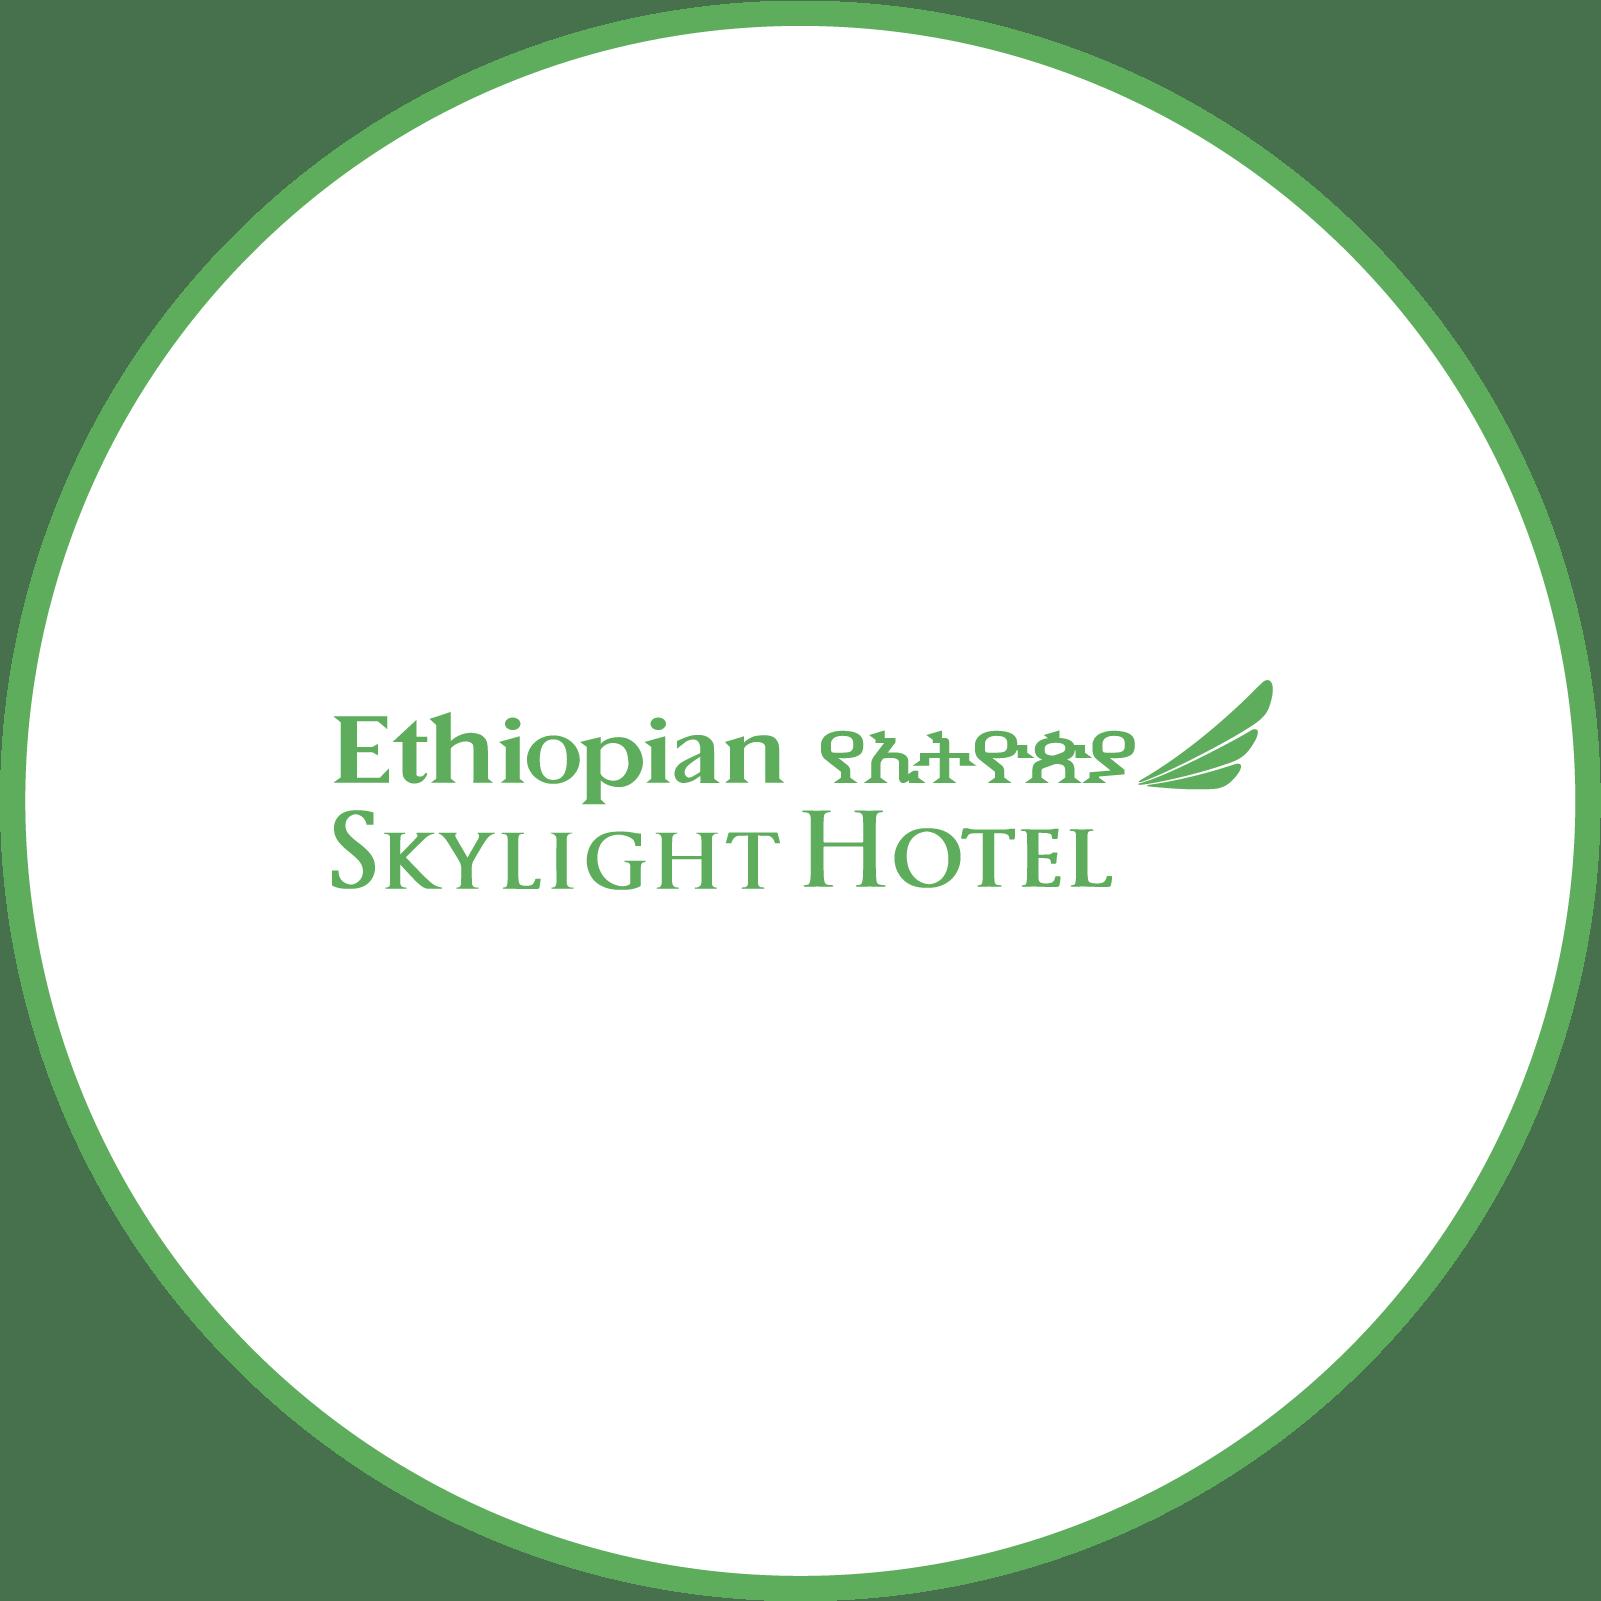 Ethiopian Skylight hotel packages